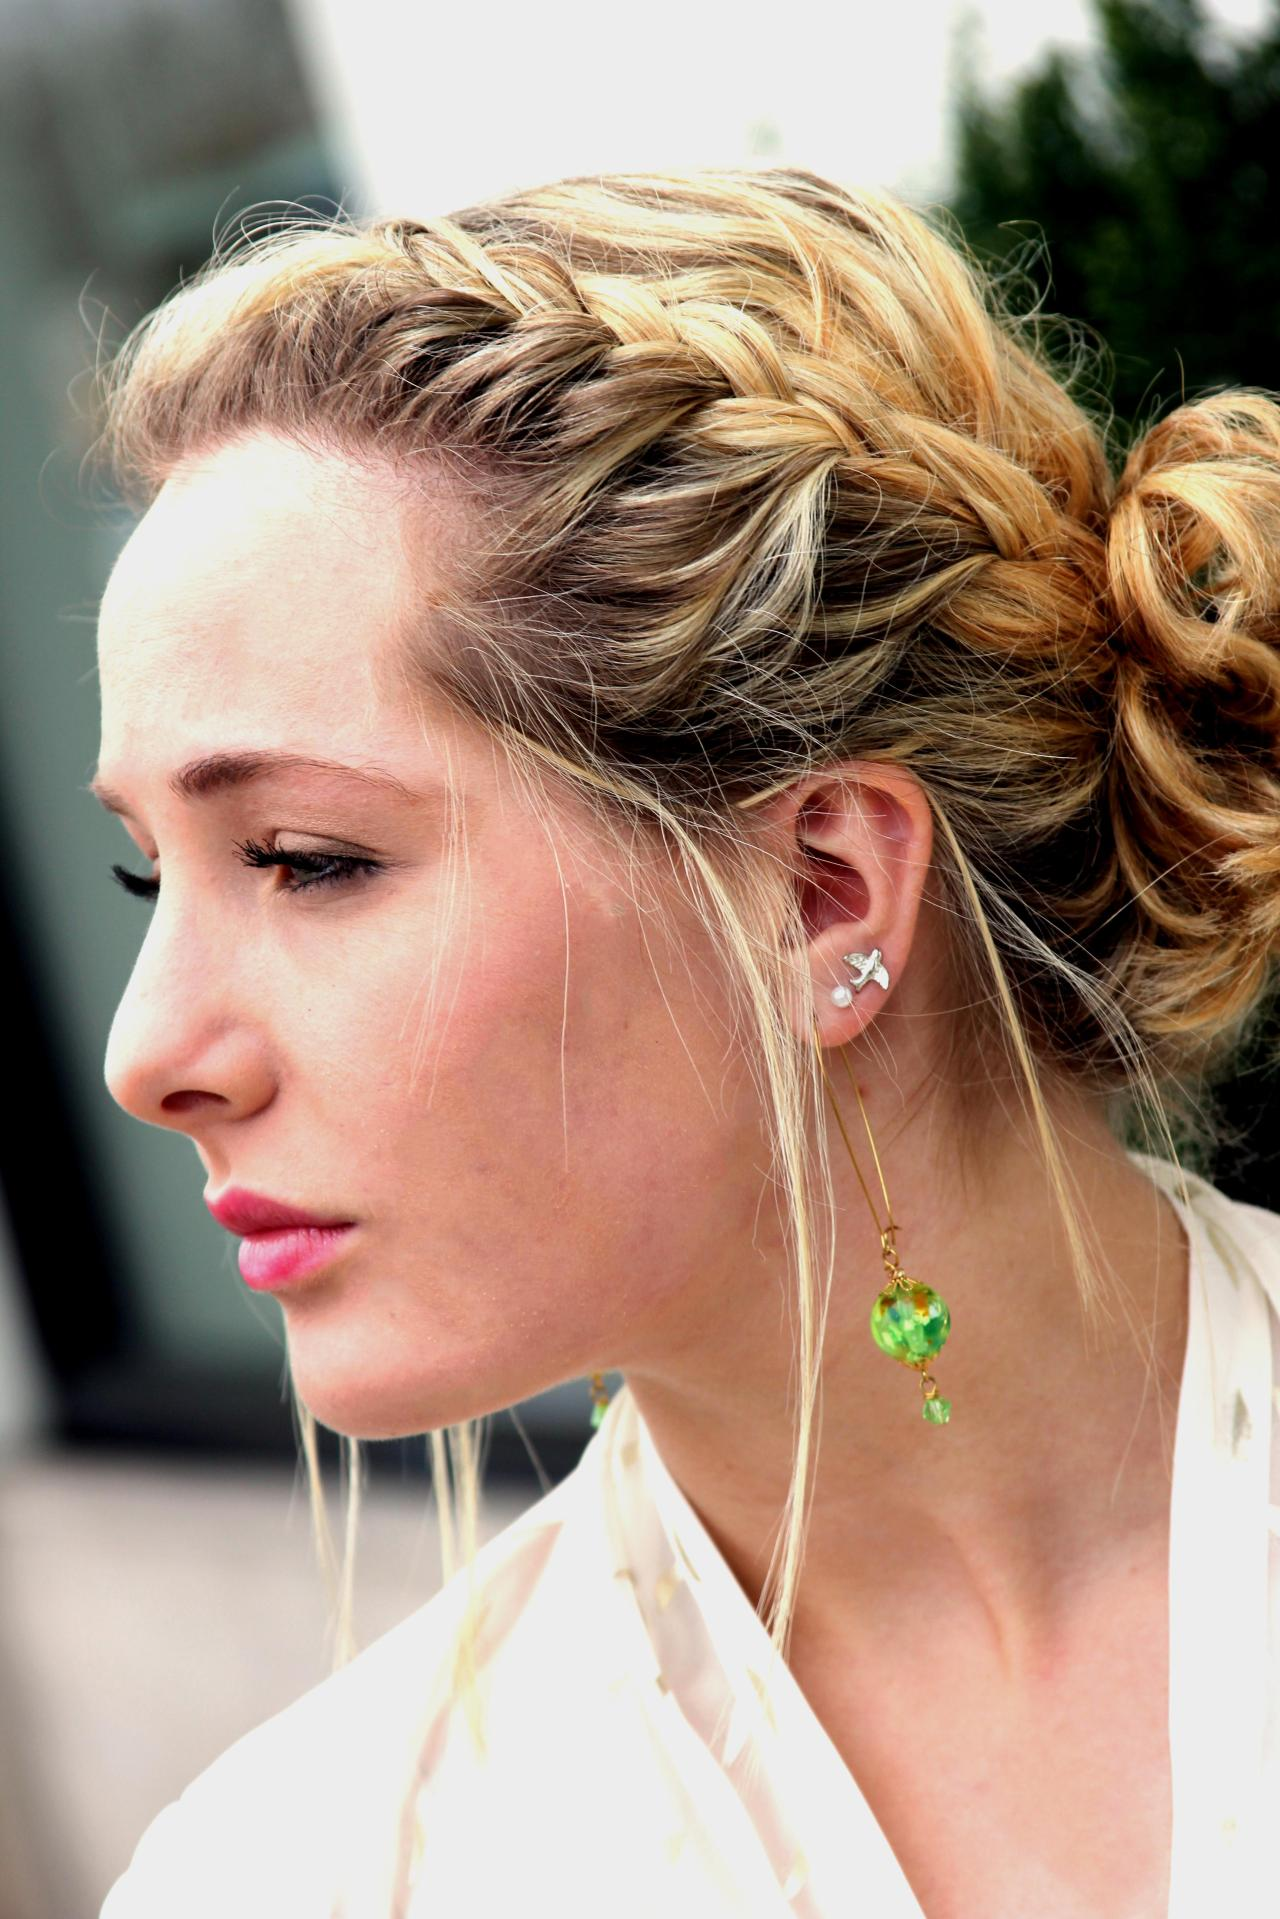 Earrings: BluKat Designs by Heather O'Cain